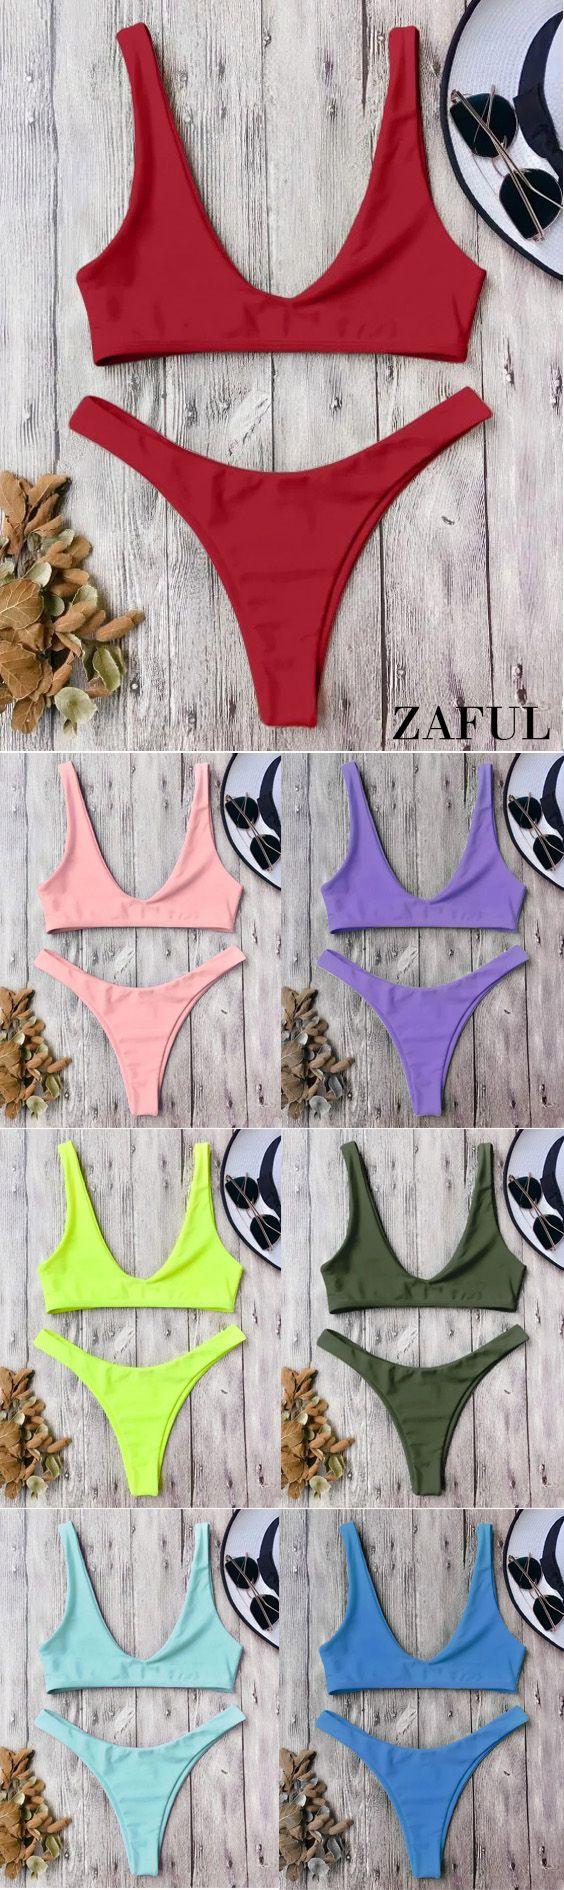 Up to 80% OFF! High Cut Bikini Set. #Zaful #Swimwear #Bikinis zaful,zaful outfits,zaful dresses,spring outfits,summer dresses,easter,super bowl,st patrick's day,cute,casual,fashion,style,bathing suit,swimsuits,one pieces,swimwear,bikini set,bikini,one piece swimwear,beach outfit,swimwear cover ups,high waisted swimsuit,tankini,high cut one piece swimsuit,high waisted swimsuit,swimwear modest,swimsuit modest,cover ups @zaful Extra 10% OFF Code:ZF2017